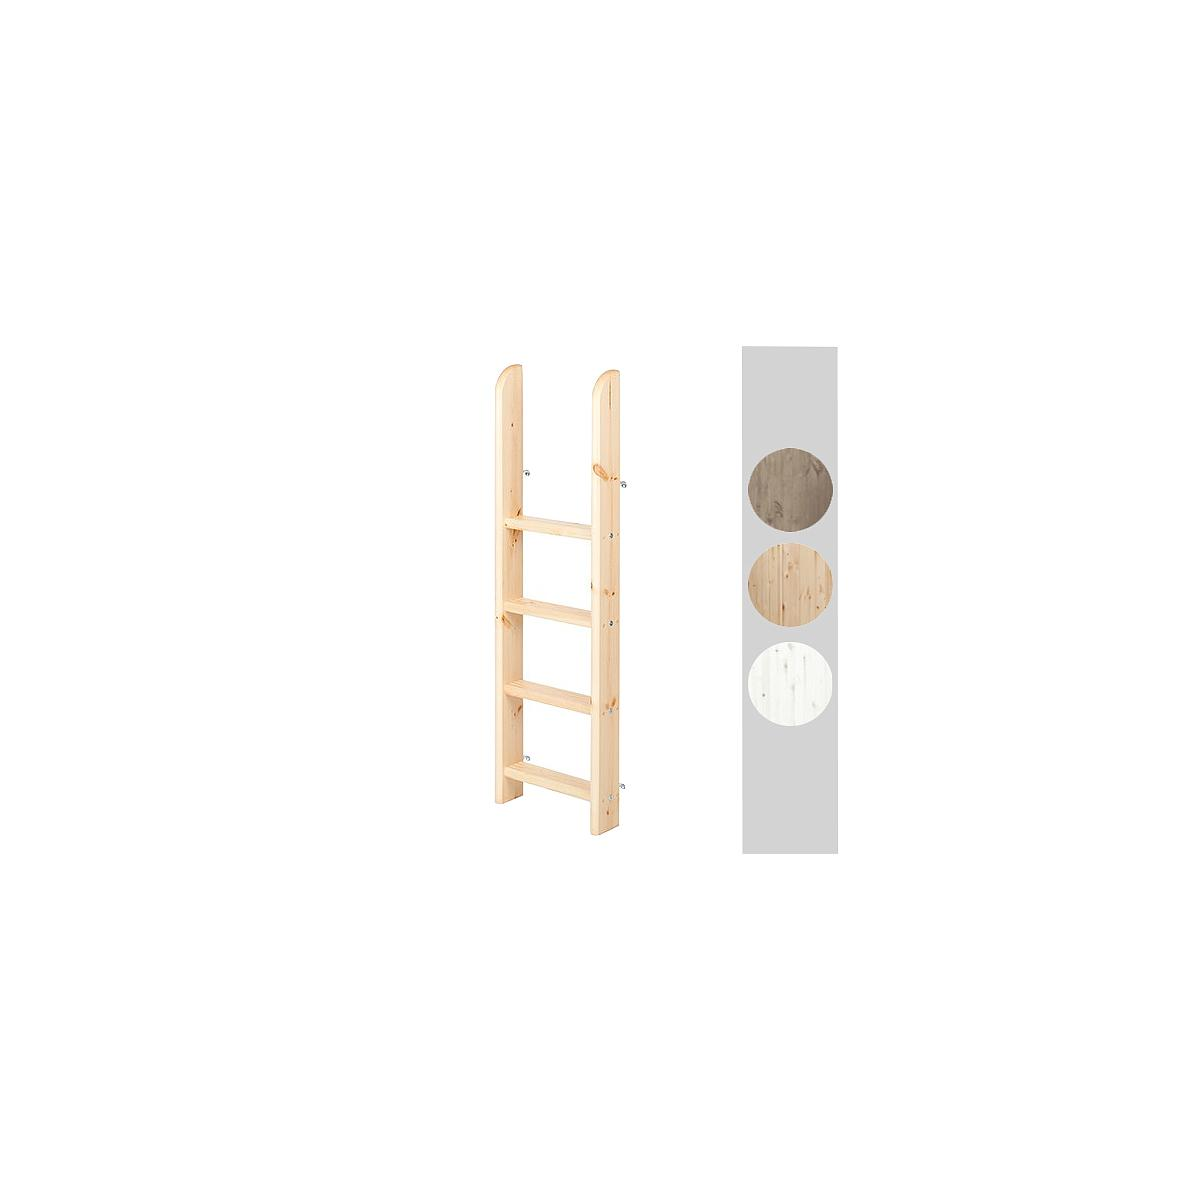 Escalera recta Cama semi alta CLASSIC Flexa blanco cal